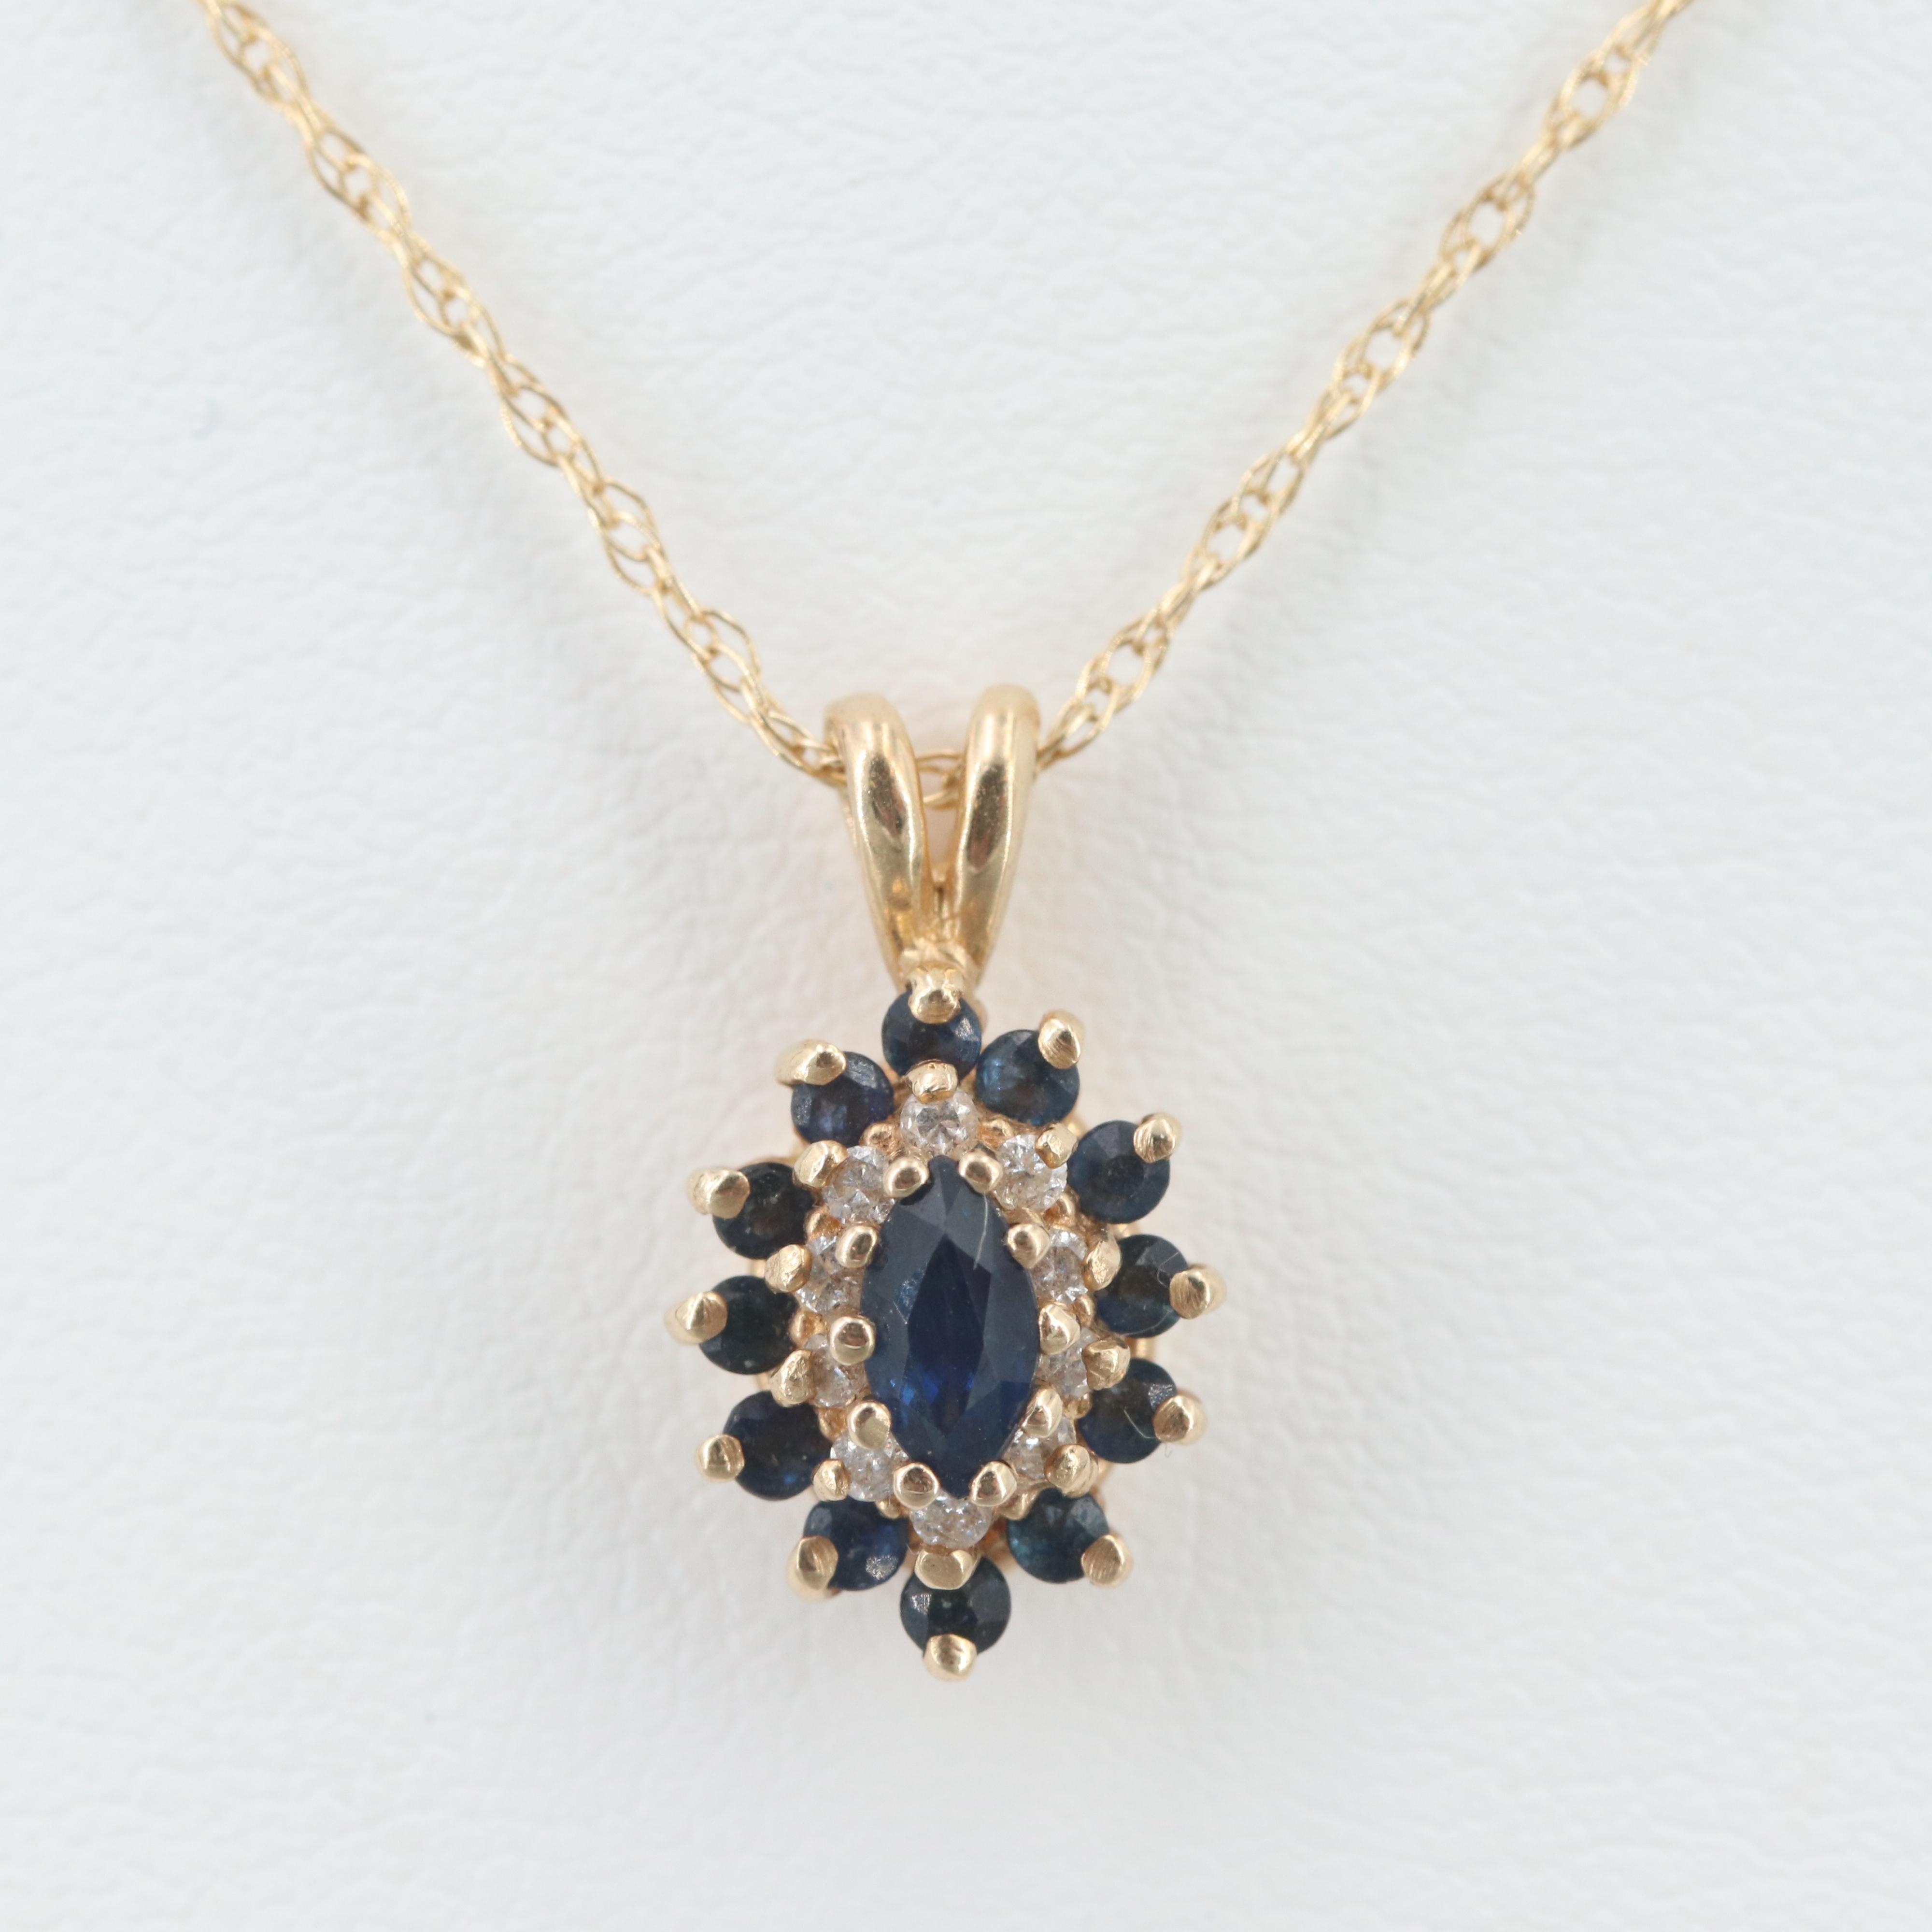 14K Yellow Gold Sapphire and Diamond Pendant Necklace